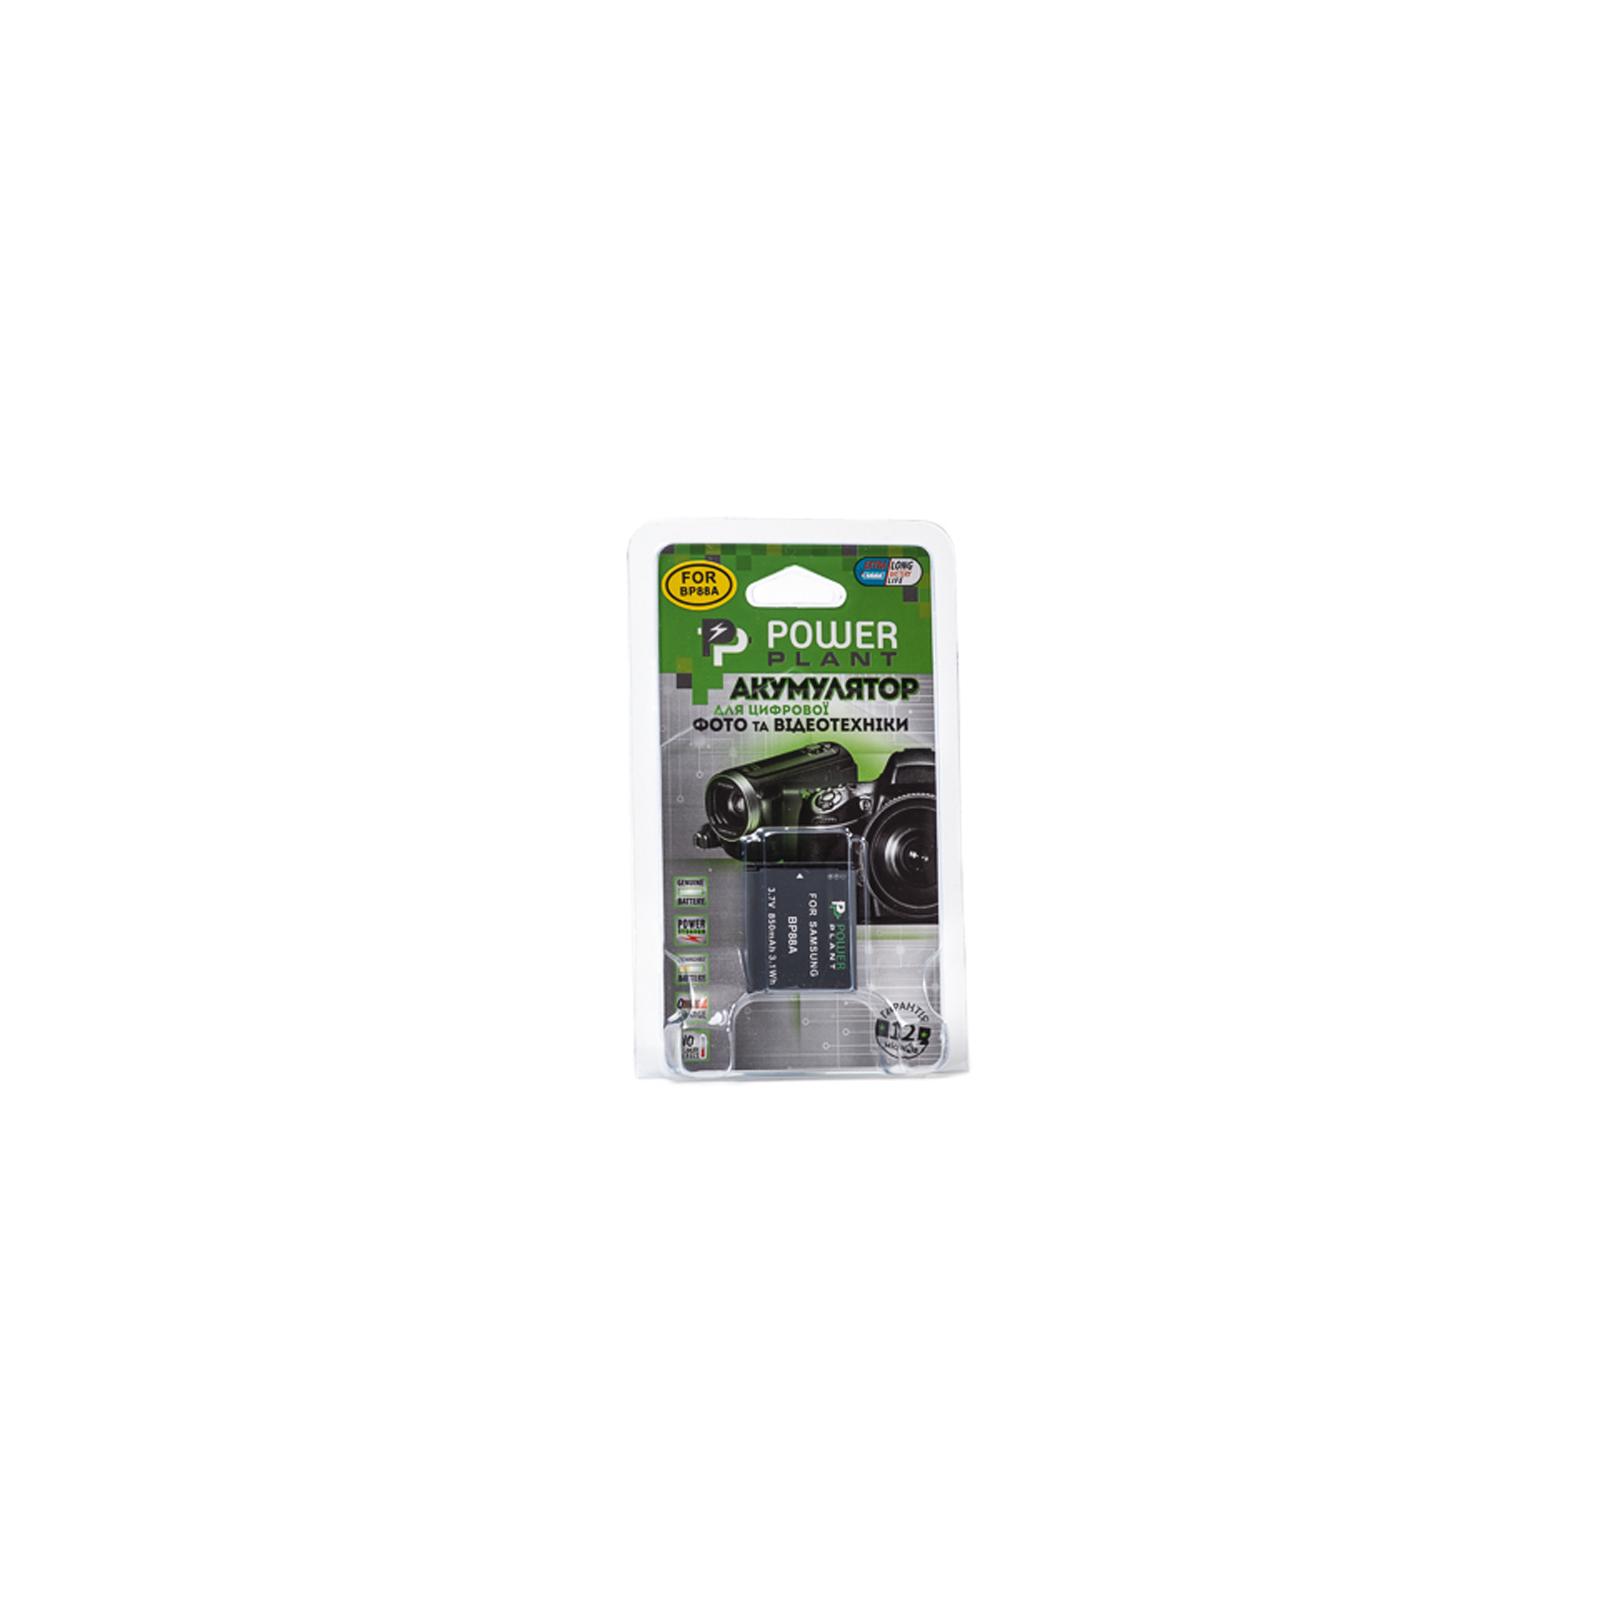 Аккумулятор к фото/видео PowerPlant Samsung BP-88A (DV00DV1344) изображение 3